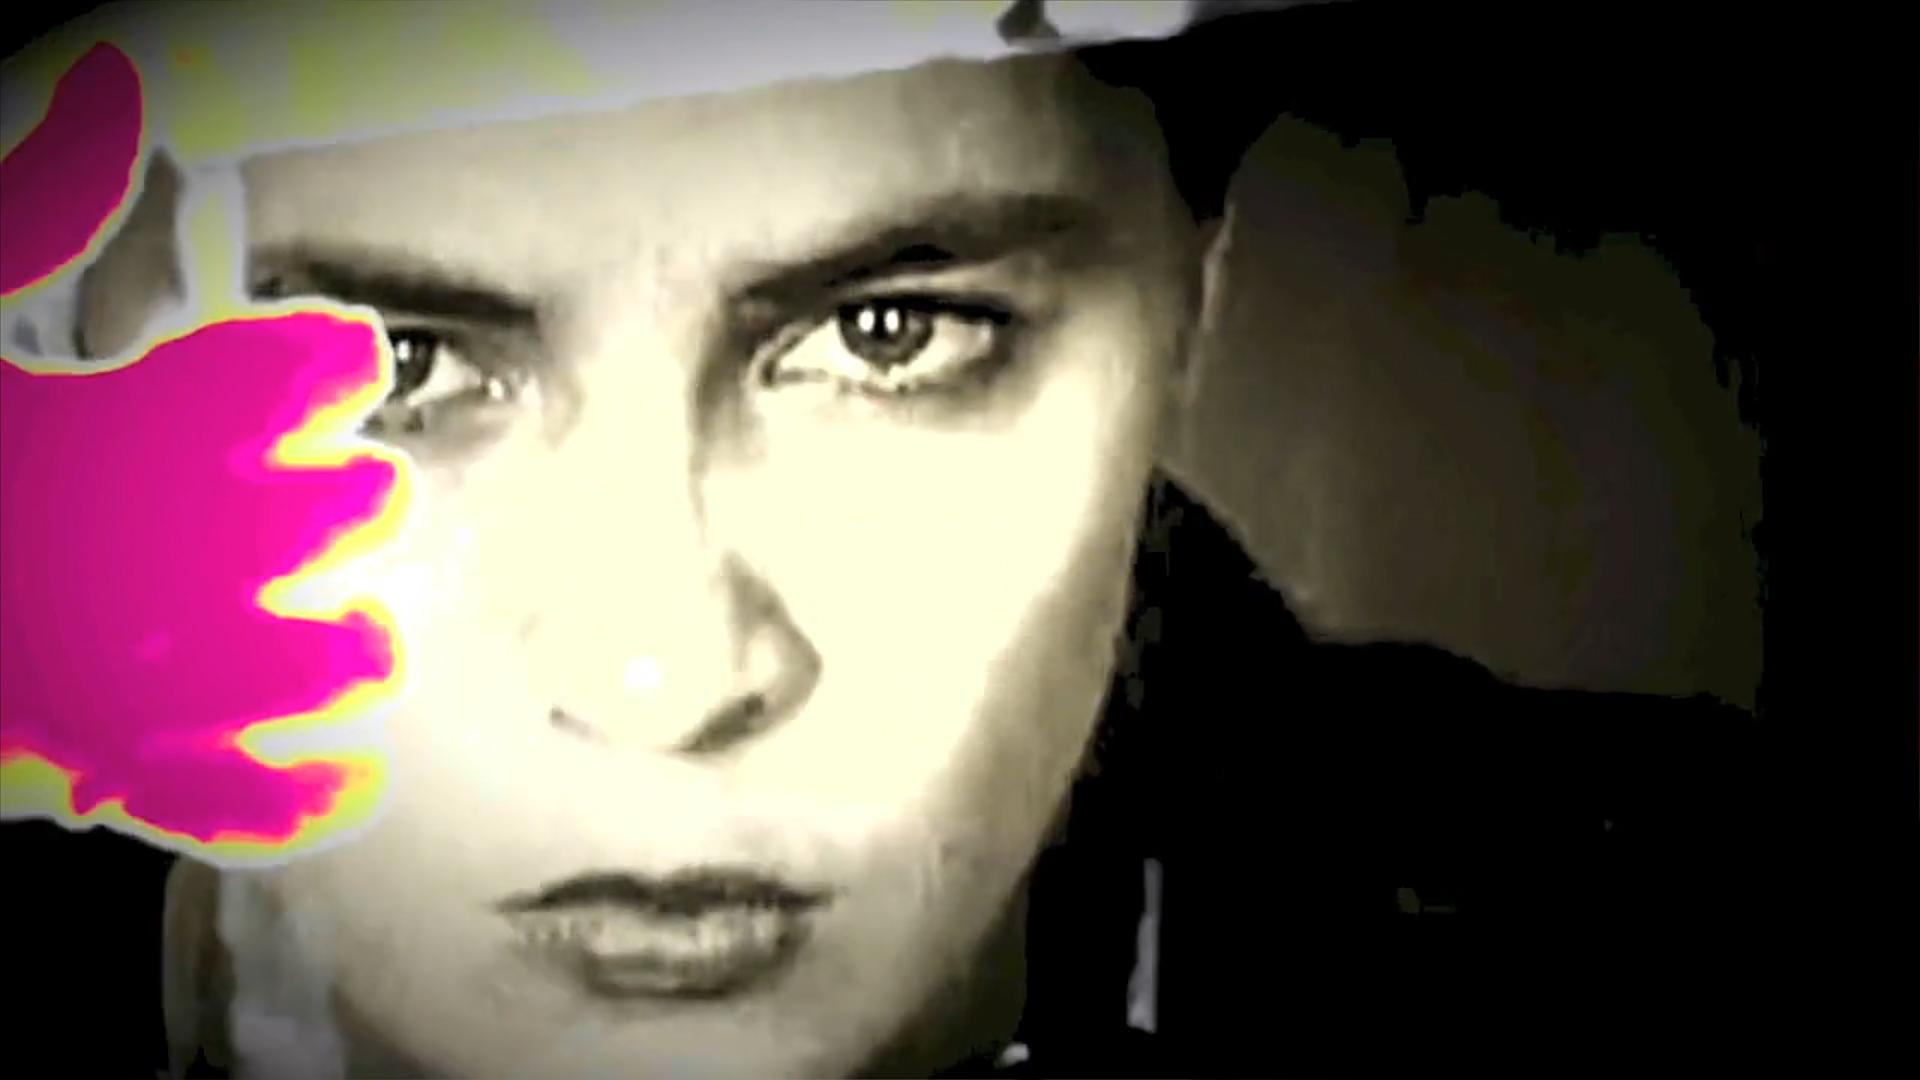 Андреј Тишма 25. јуна о видео уметности Гвендолин Одри Фостер (САД)